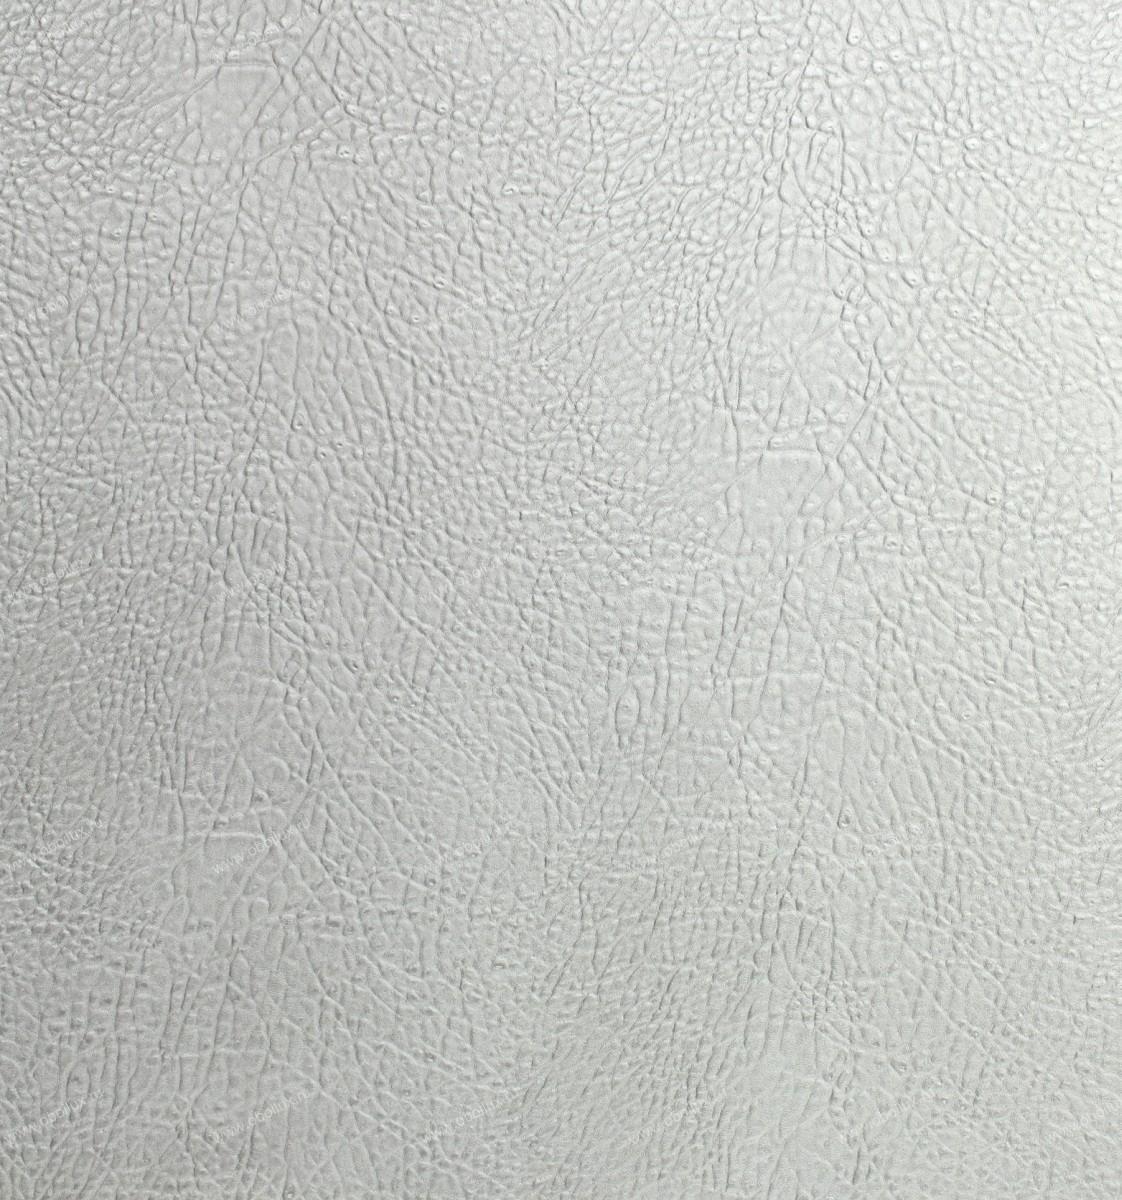 Итальянские обои Sirpi,  коллекция Decoskin, артикул14837